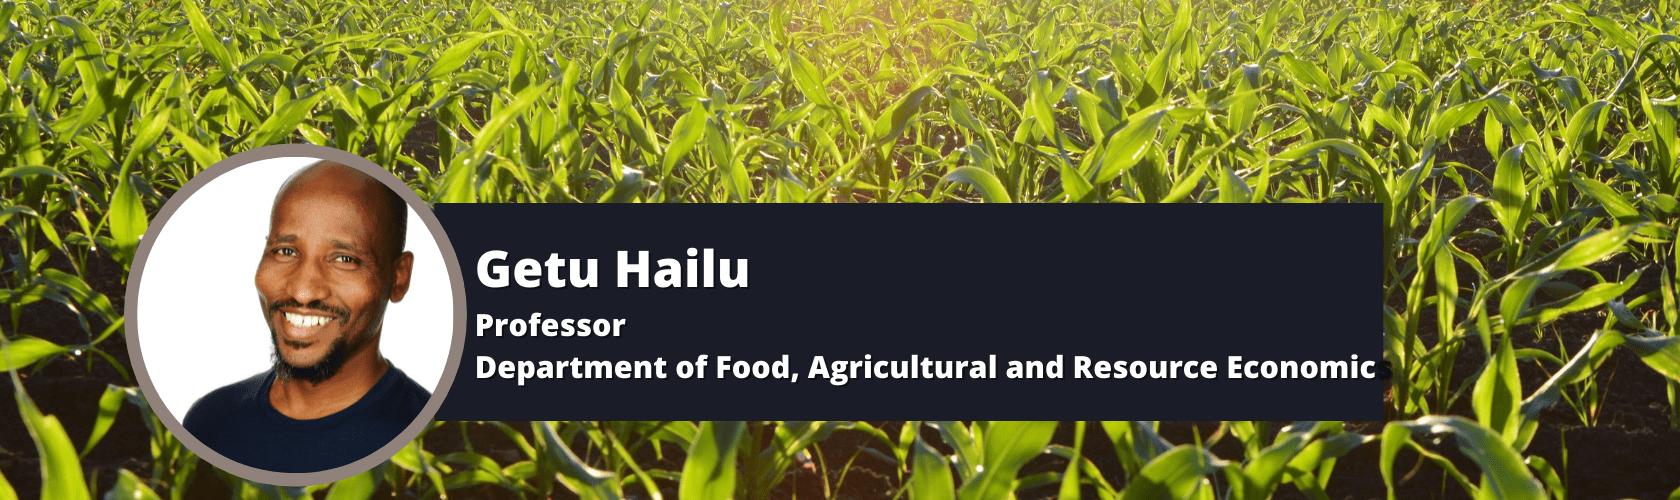 Getu Hailu Header Image